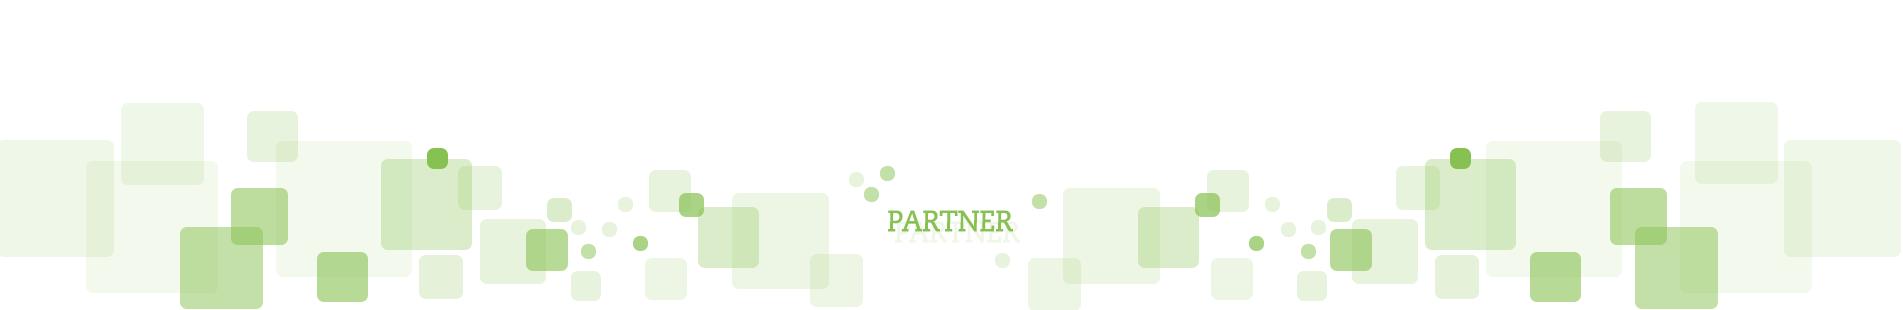 Motiv: Partner